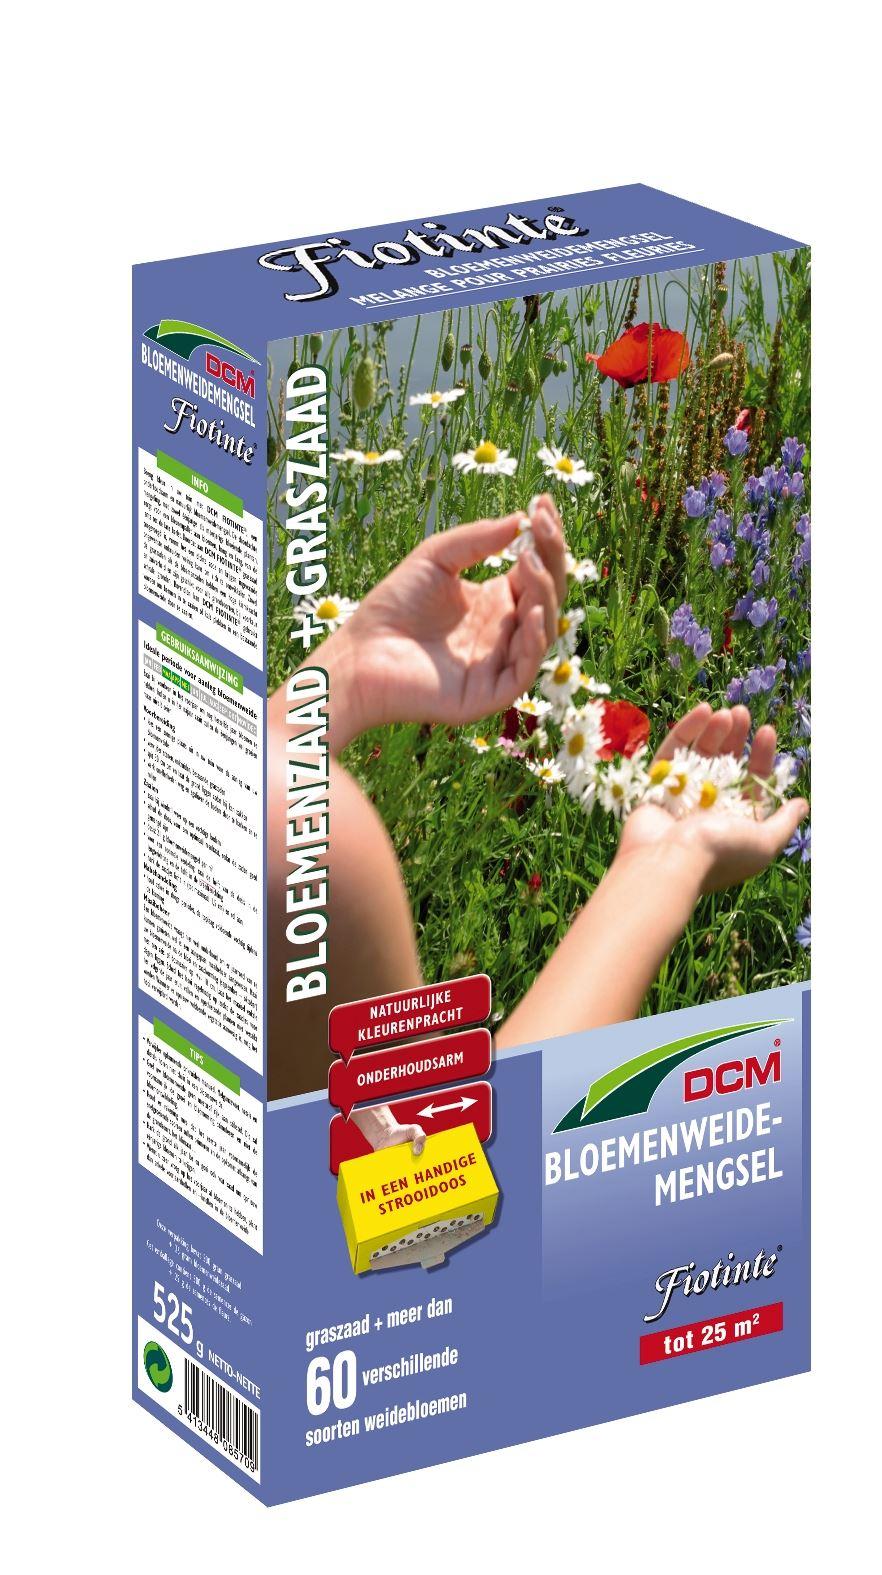 Fiotinte - bloemenweide gemengd met graszaad 525gr